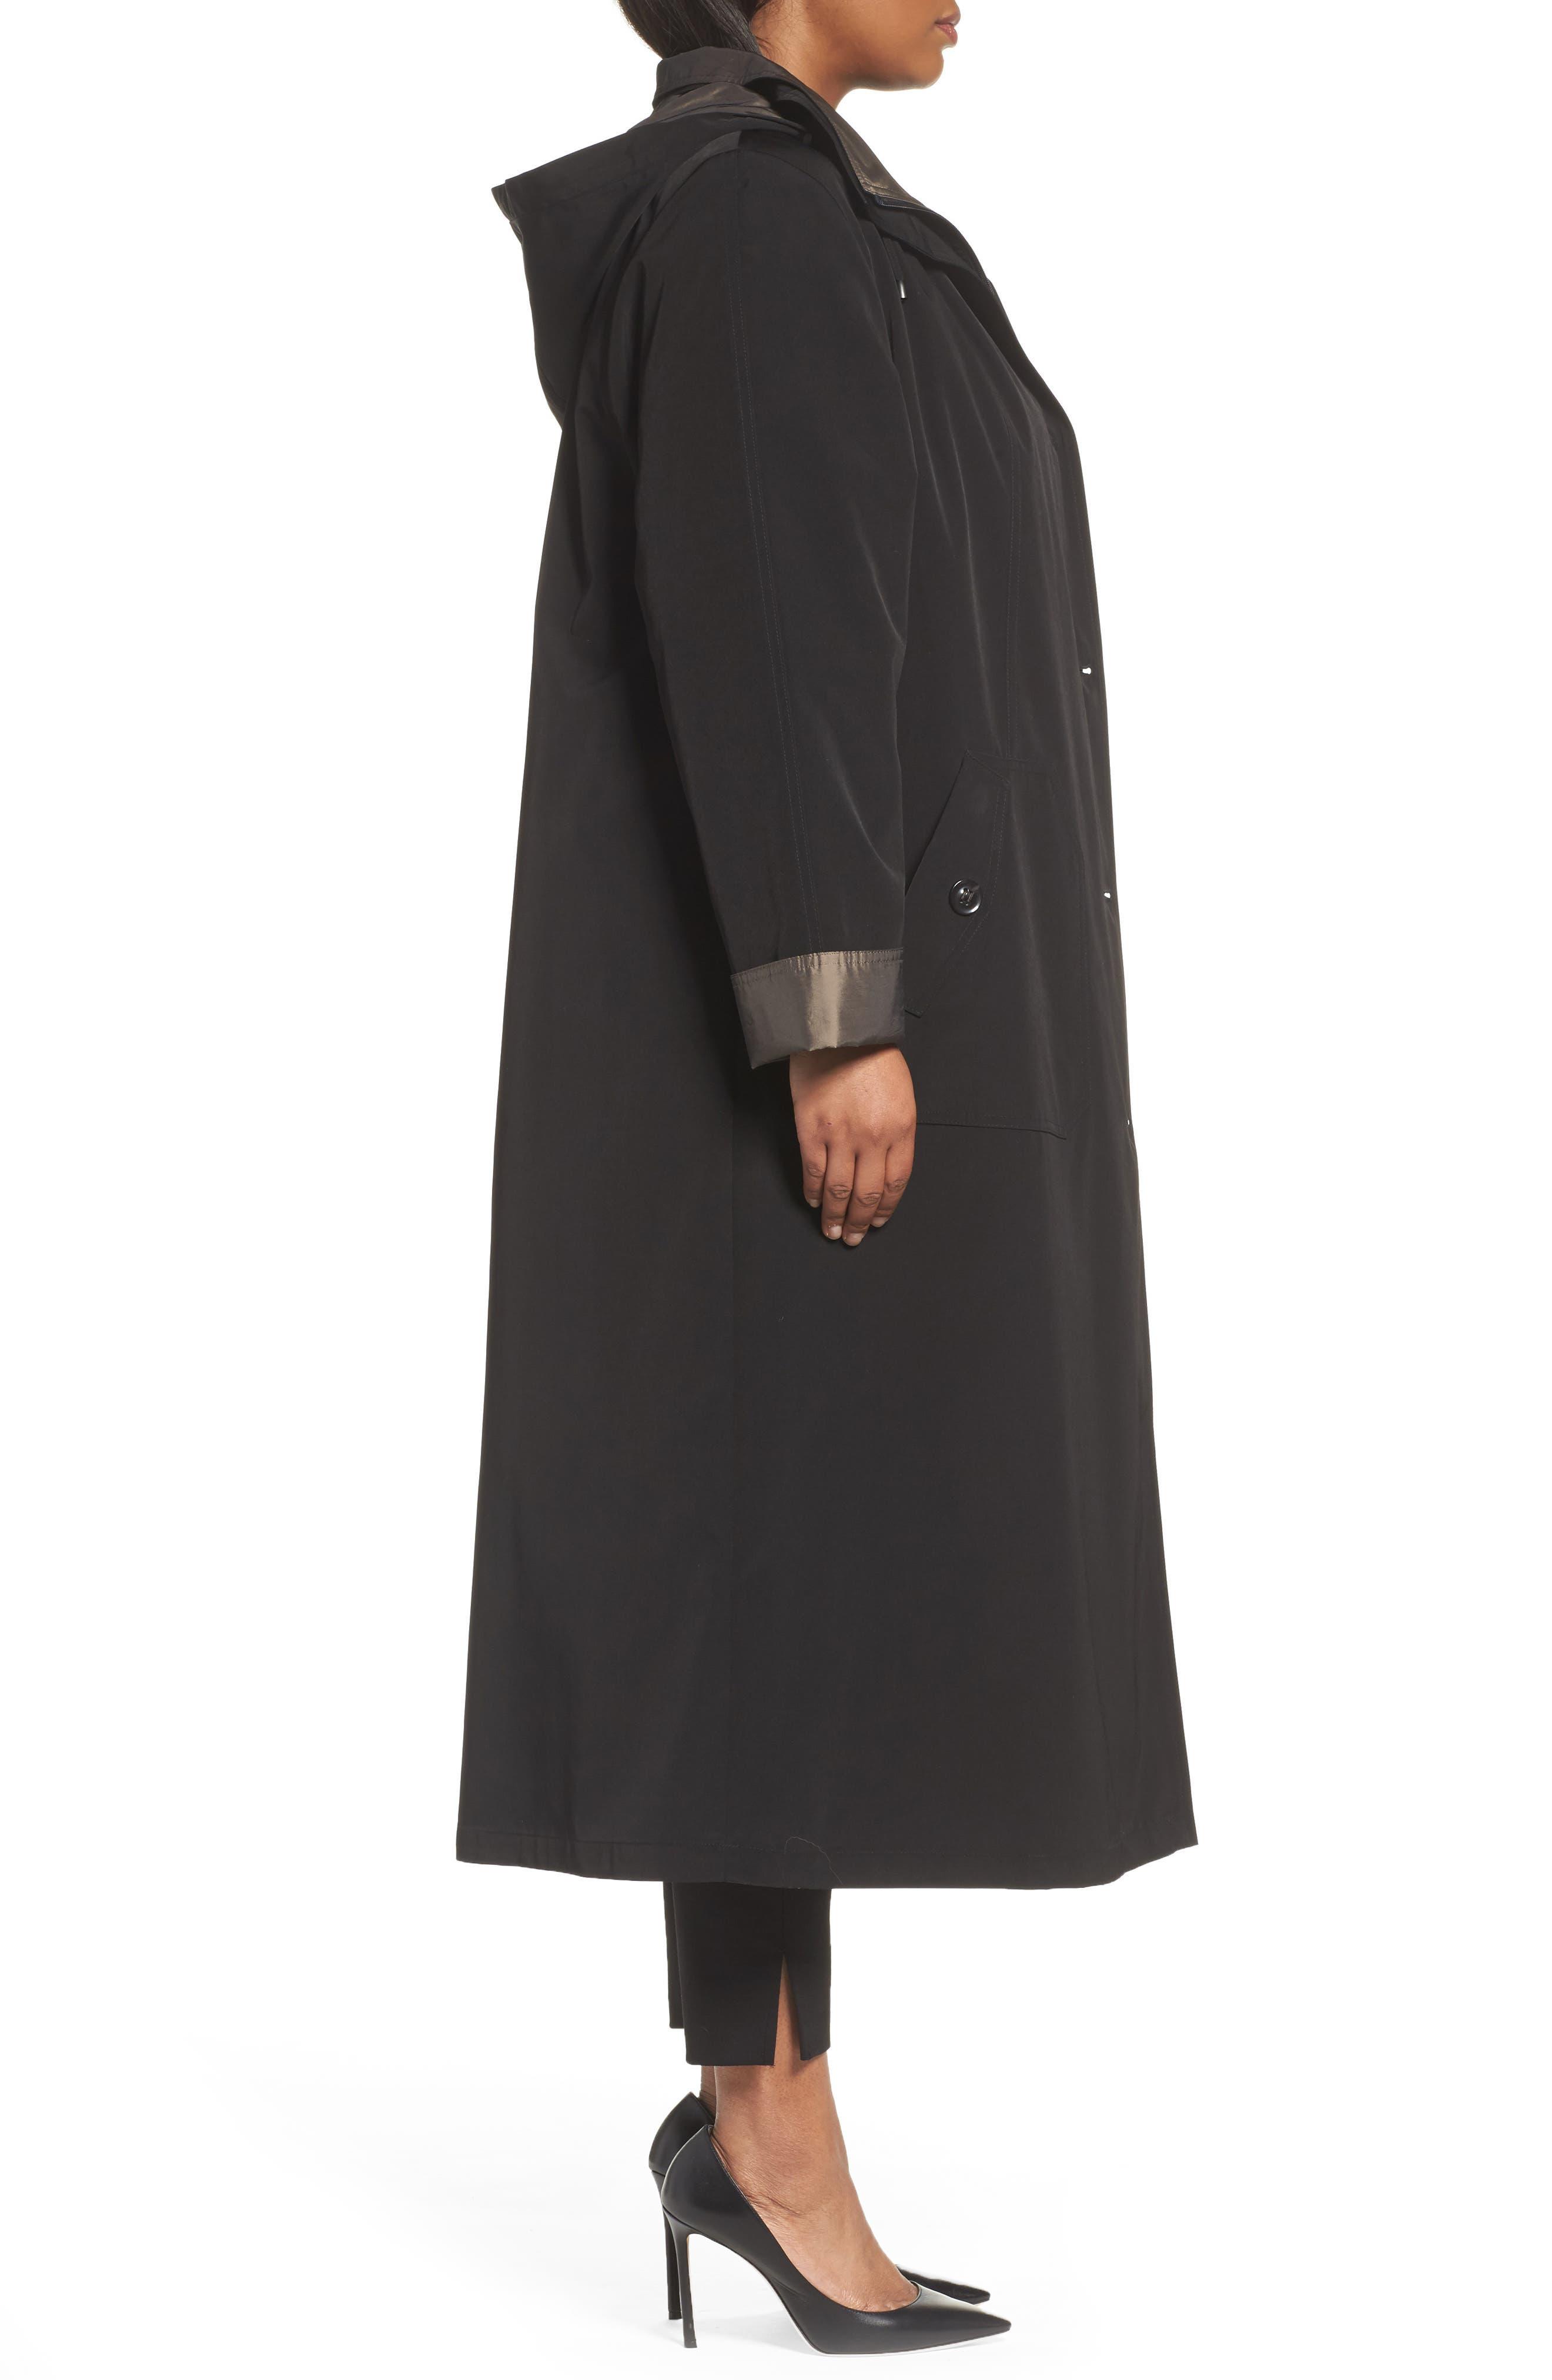 Long Raincoat with Detachable Hood & Liner,                             Alternate thumbnail 3, color,                             BLACK